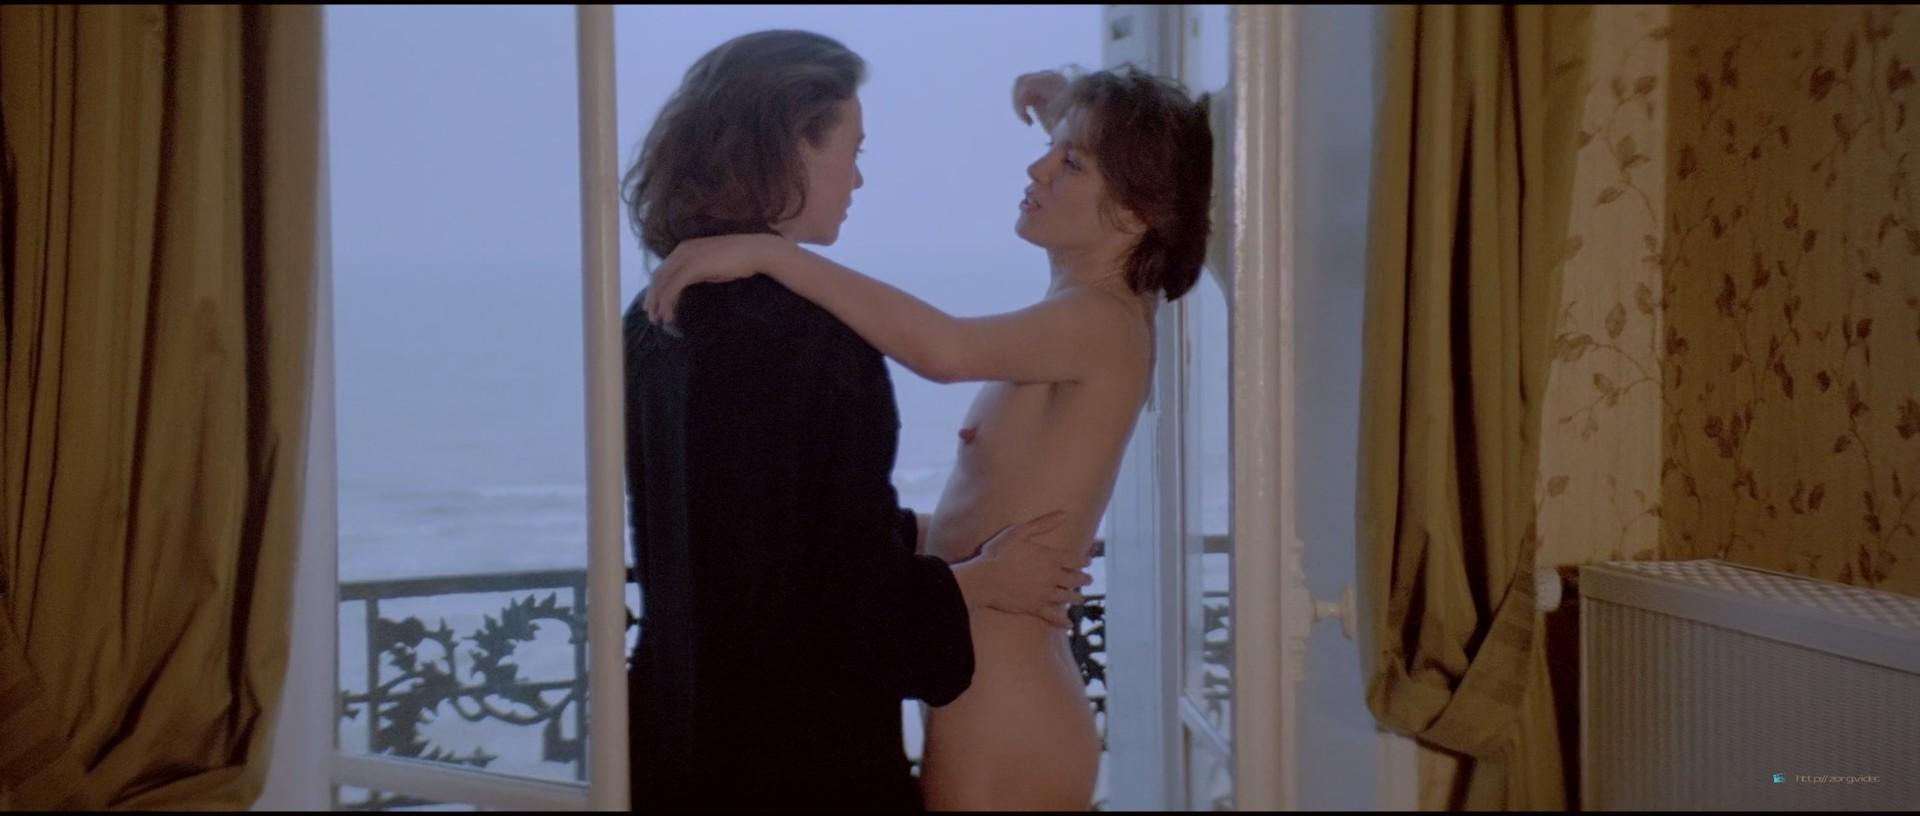 Jane Birkin nude bush Maruschka Detmers nude full frontal - La pirate (FR-1984) HD 1080p BluRay (8)